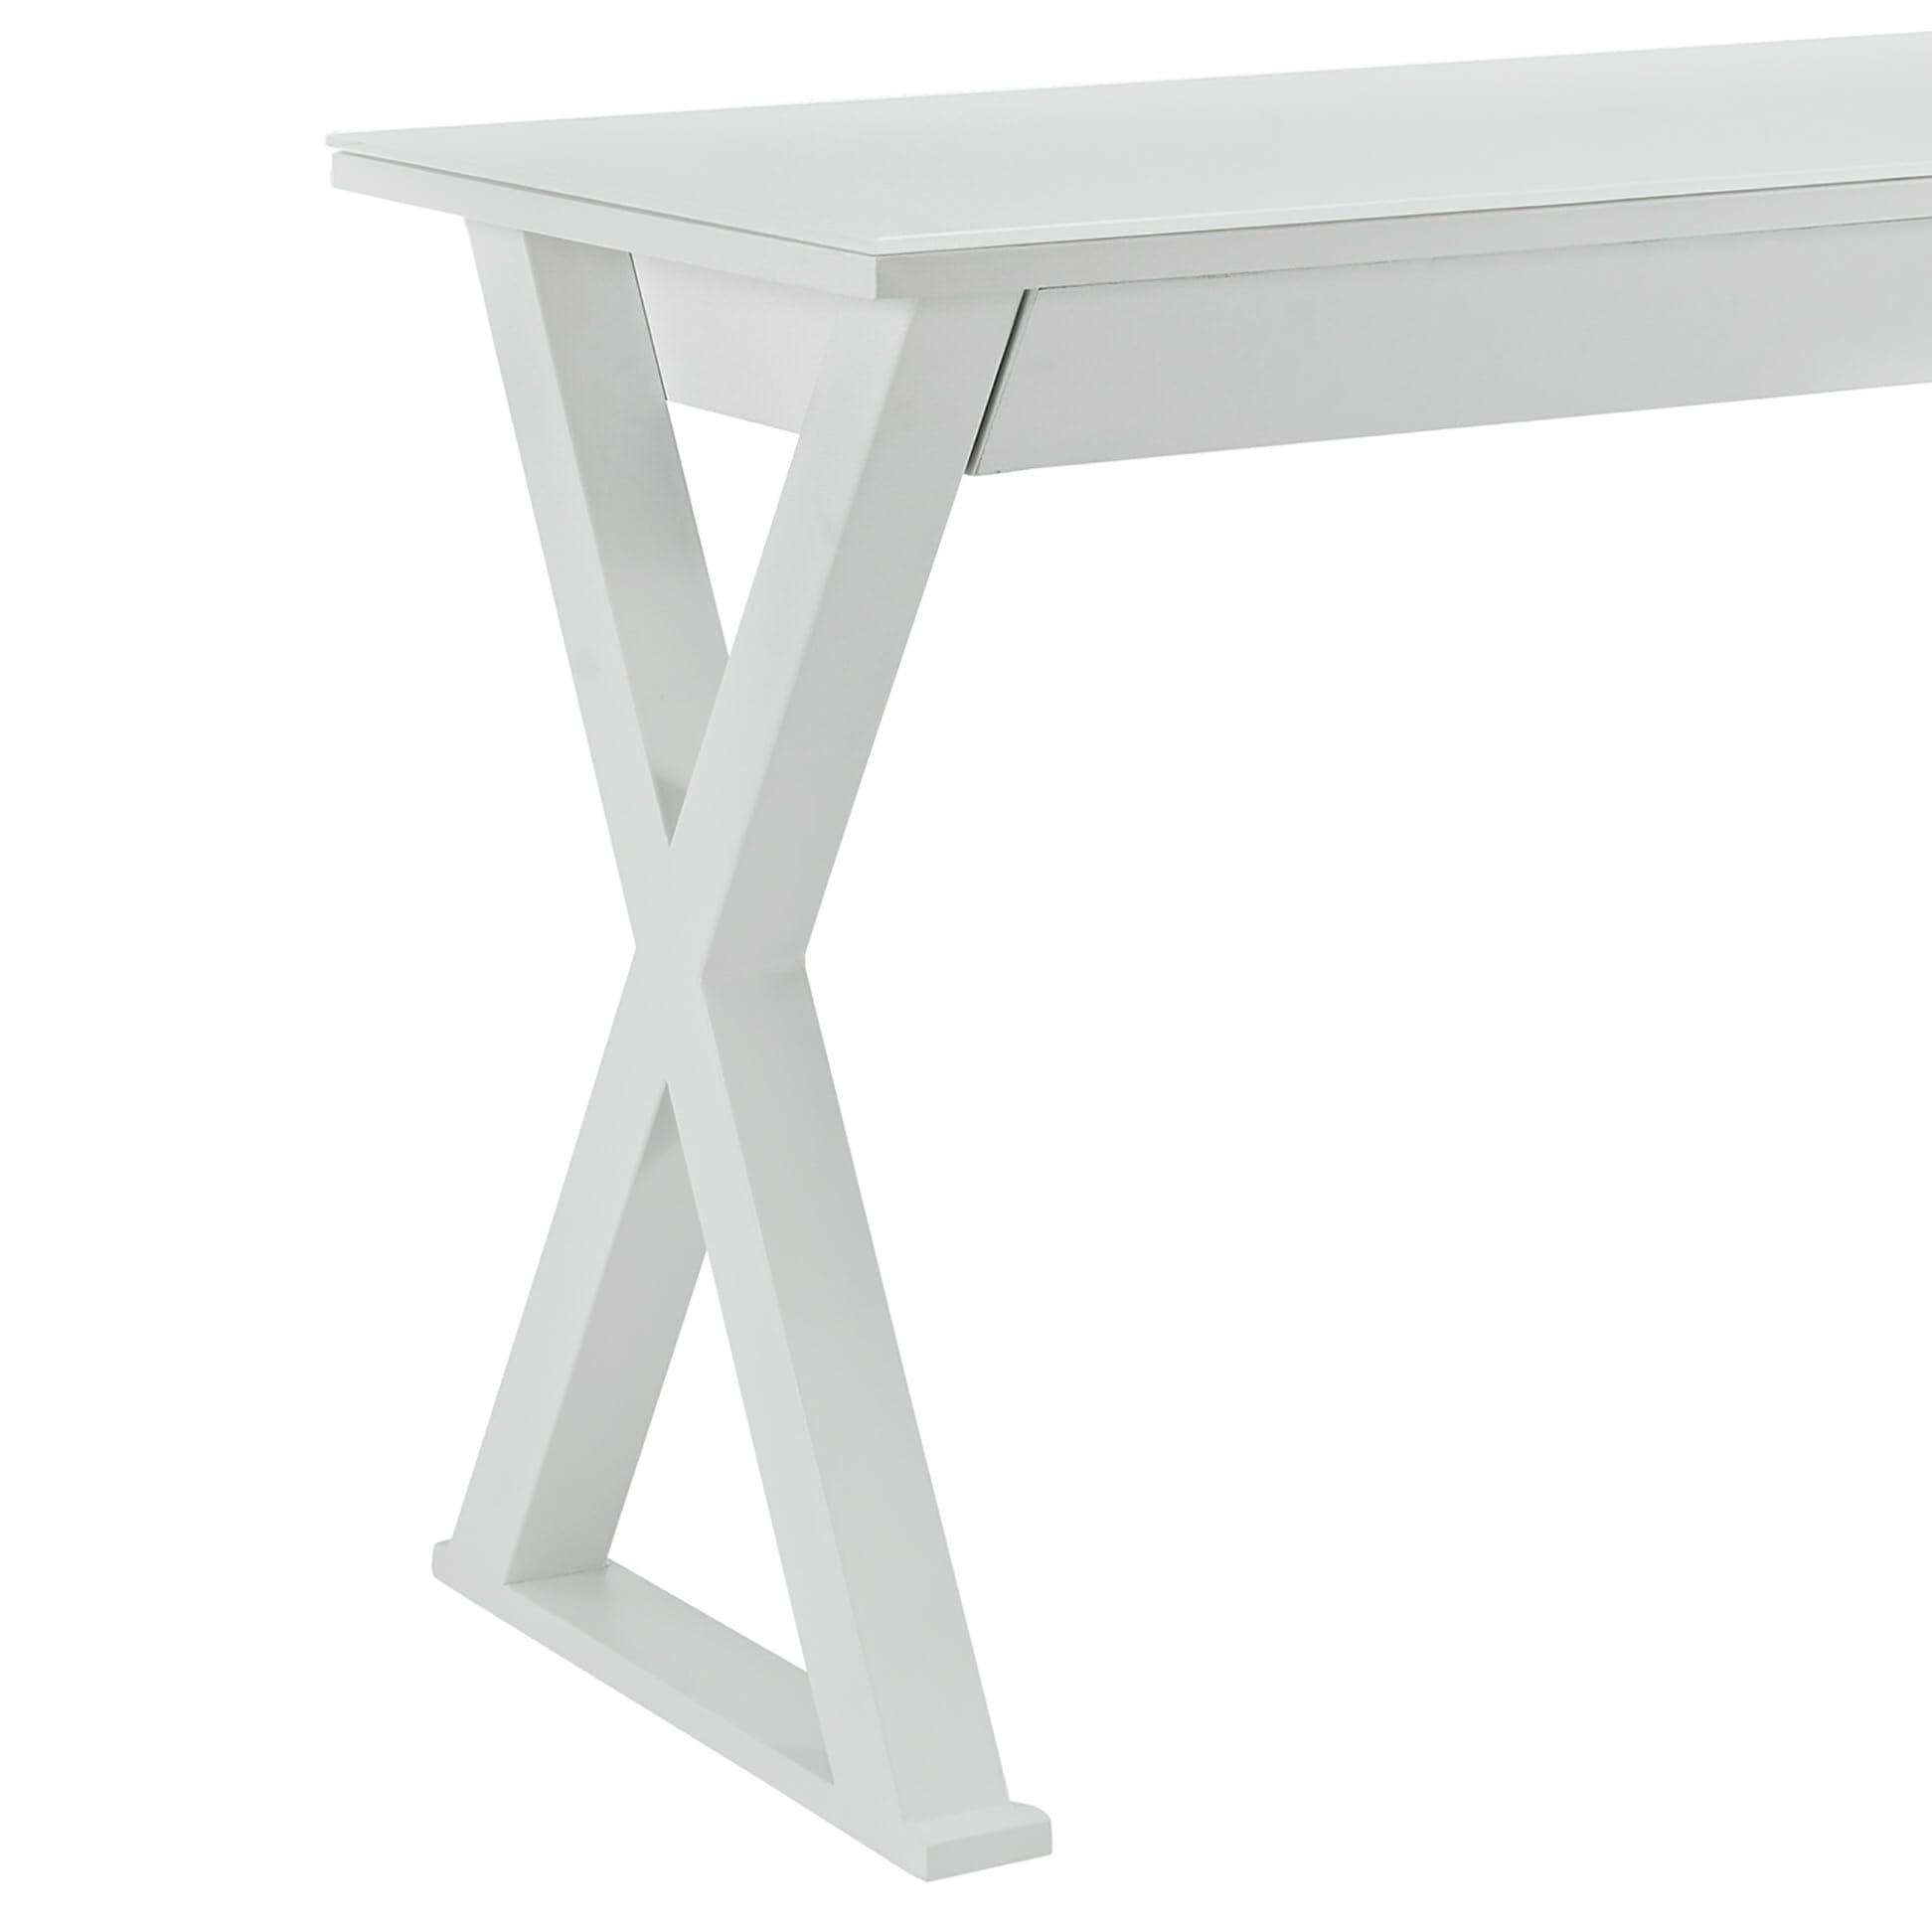 Fabulous Xtra 48 Inch Computer Desk White By Walker Edison Interior Design Ideas Skatsoteloinfo